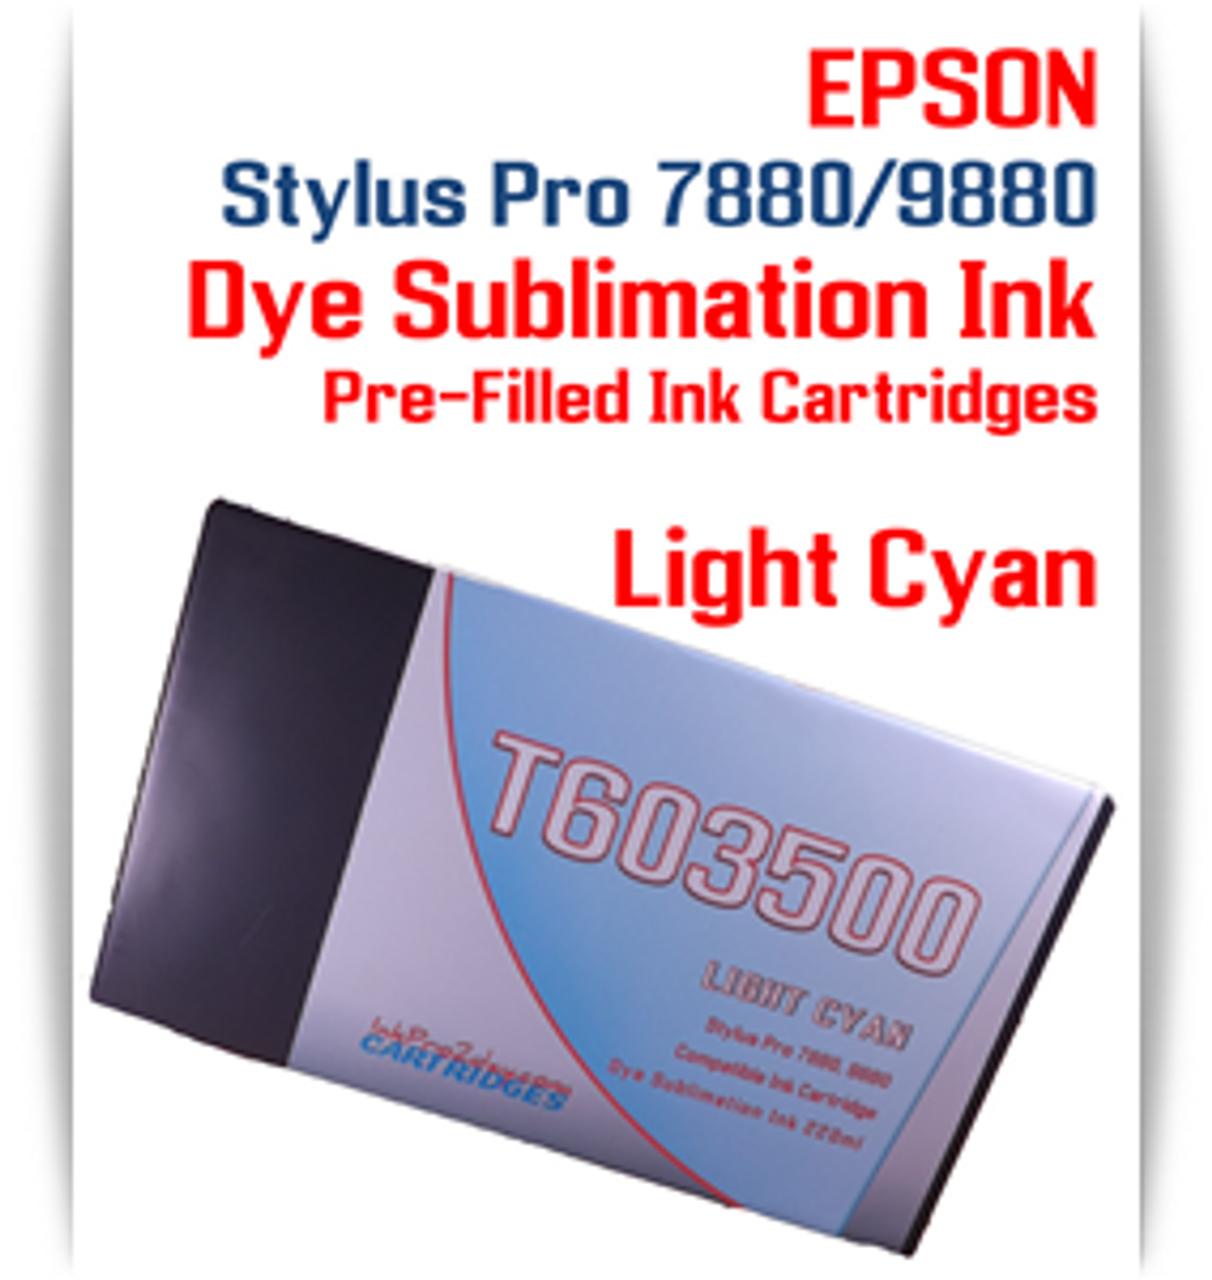 Light Cyan Epson Stylus Pro 7880/9880 Pre-Filled with Dye Sublimation Ink Cartridge 220ml